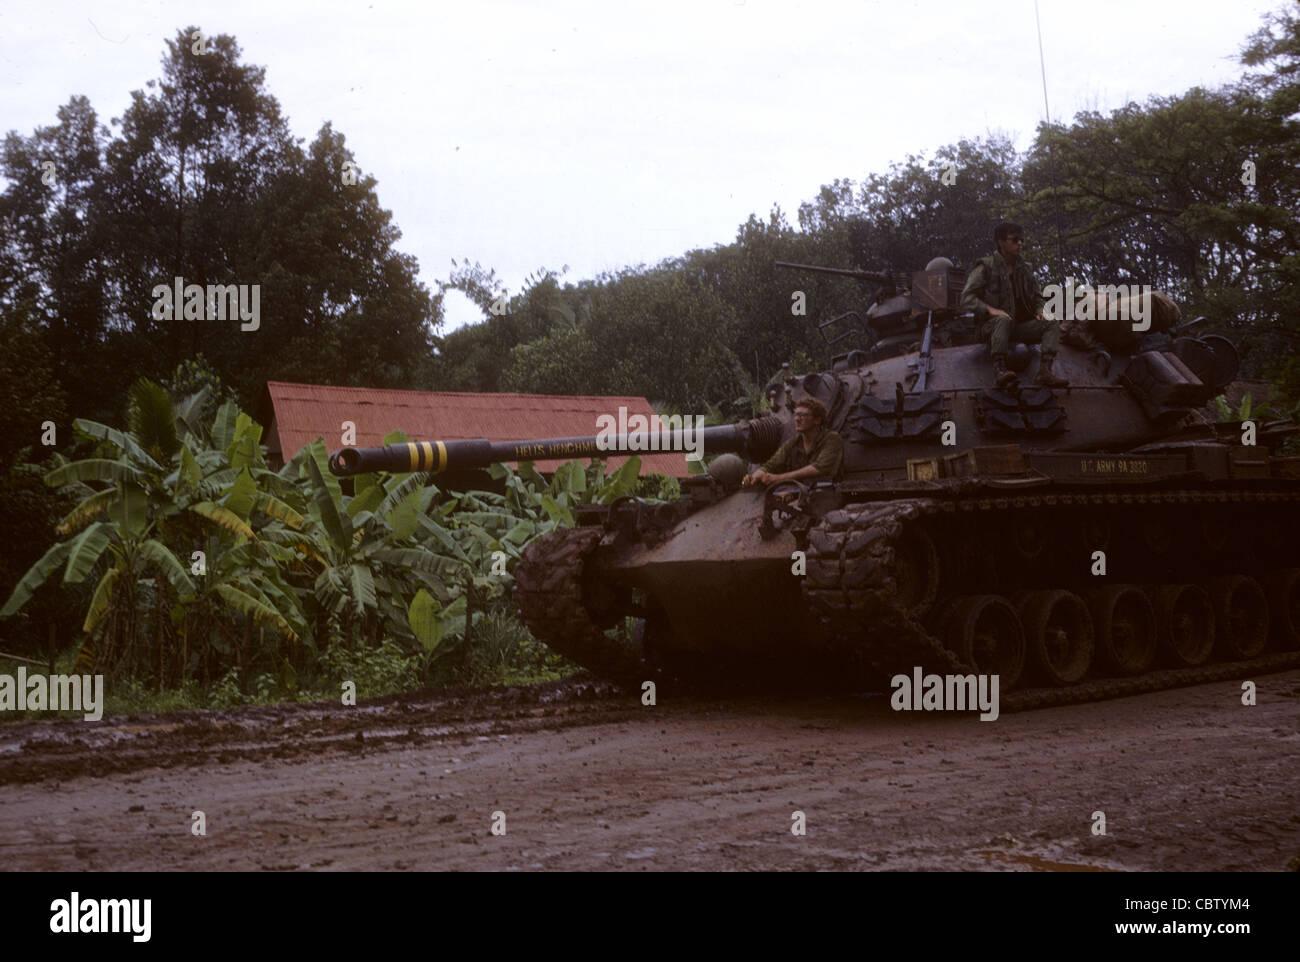 Vietnam War 1954-1975 11th-acr-tank-on-muddy-road-near-quan-loi-us-army-americans-gis-vietnam-CBTYM4